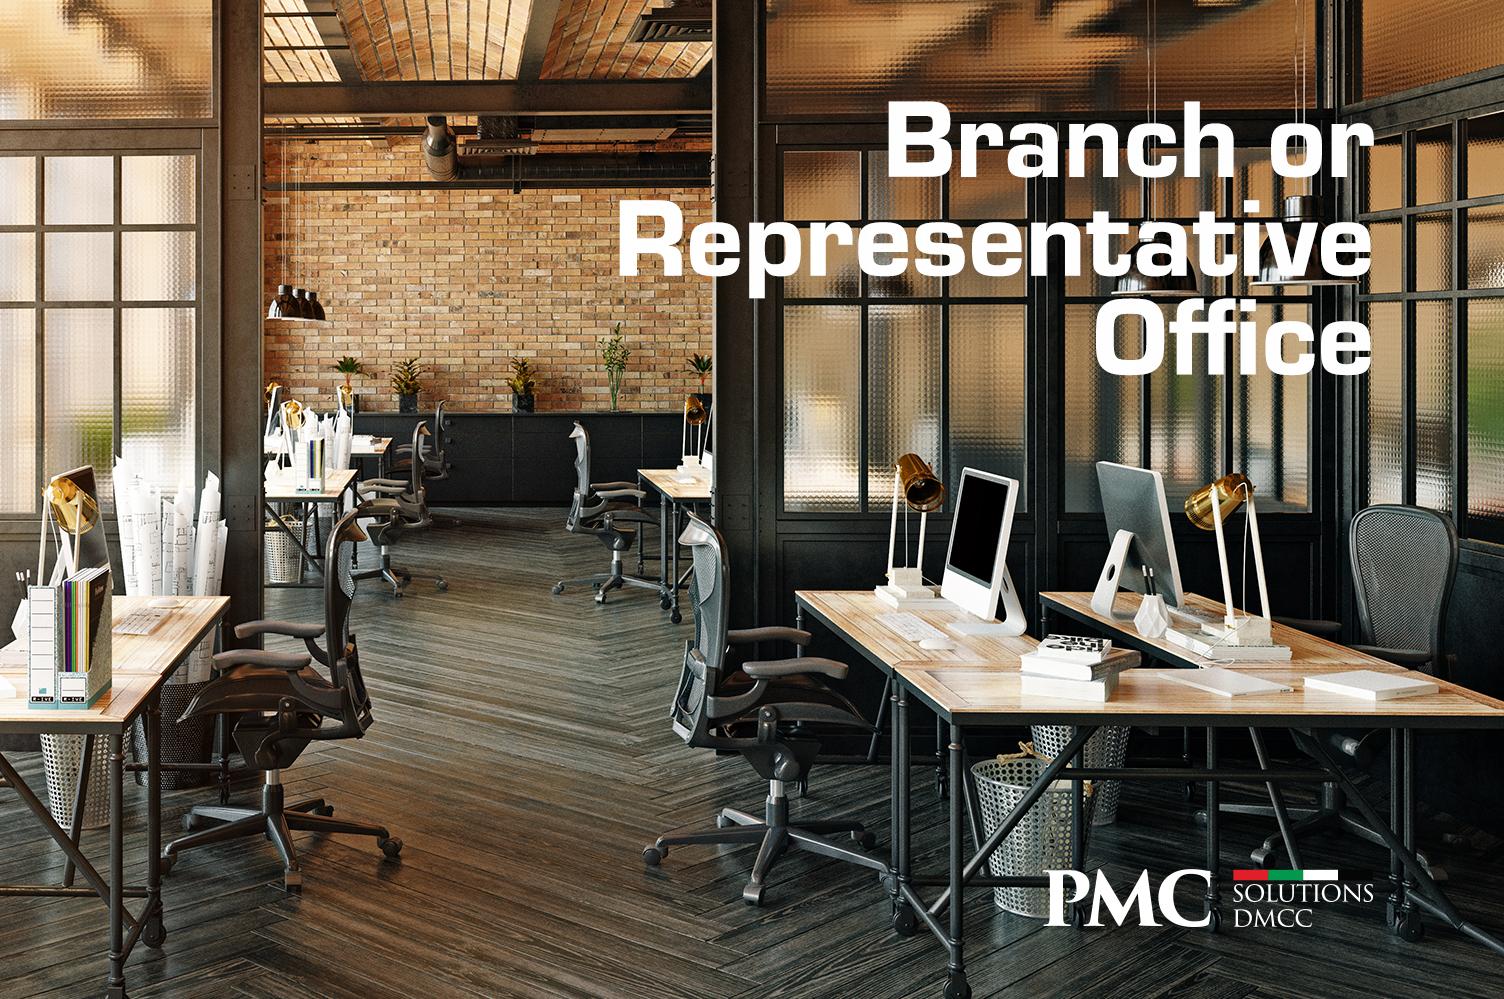 Branch or Representative Office?